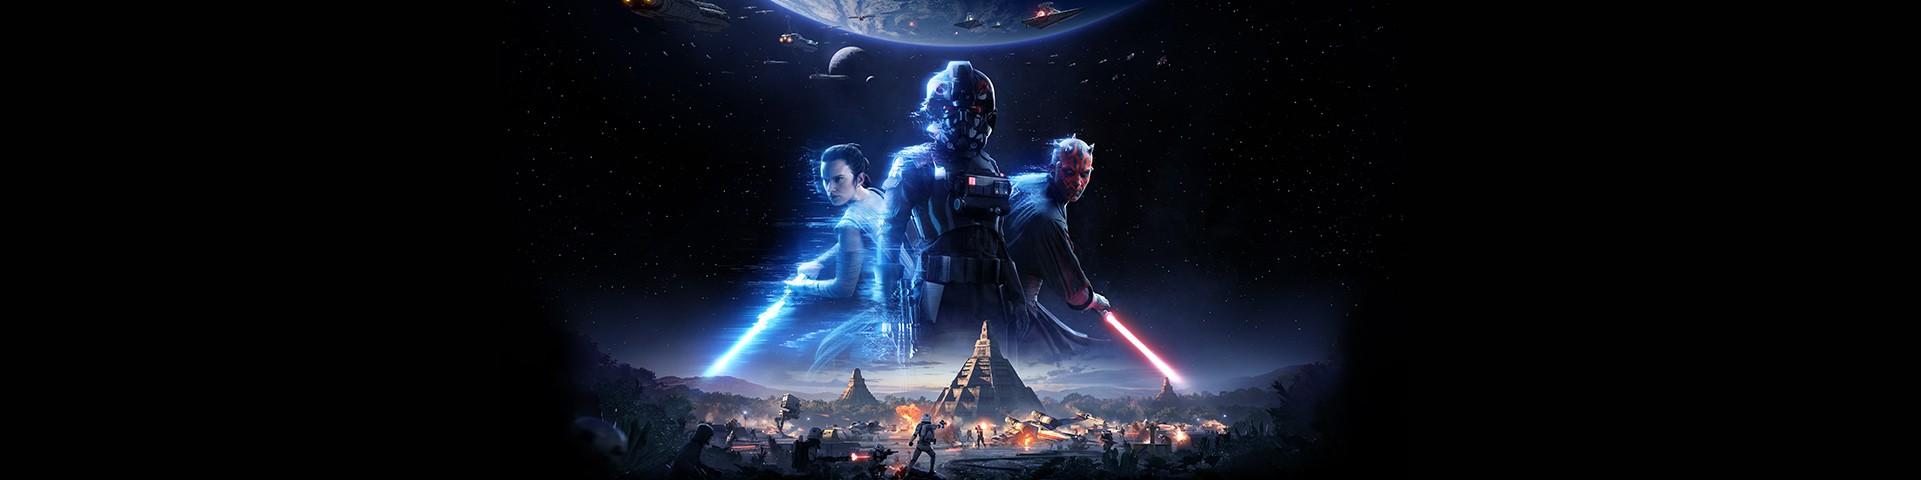 Game star wars battlefront 2 pc new usa casinos